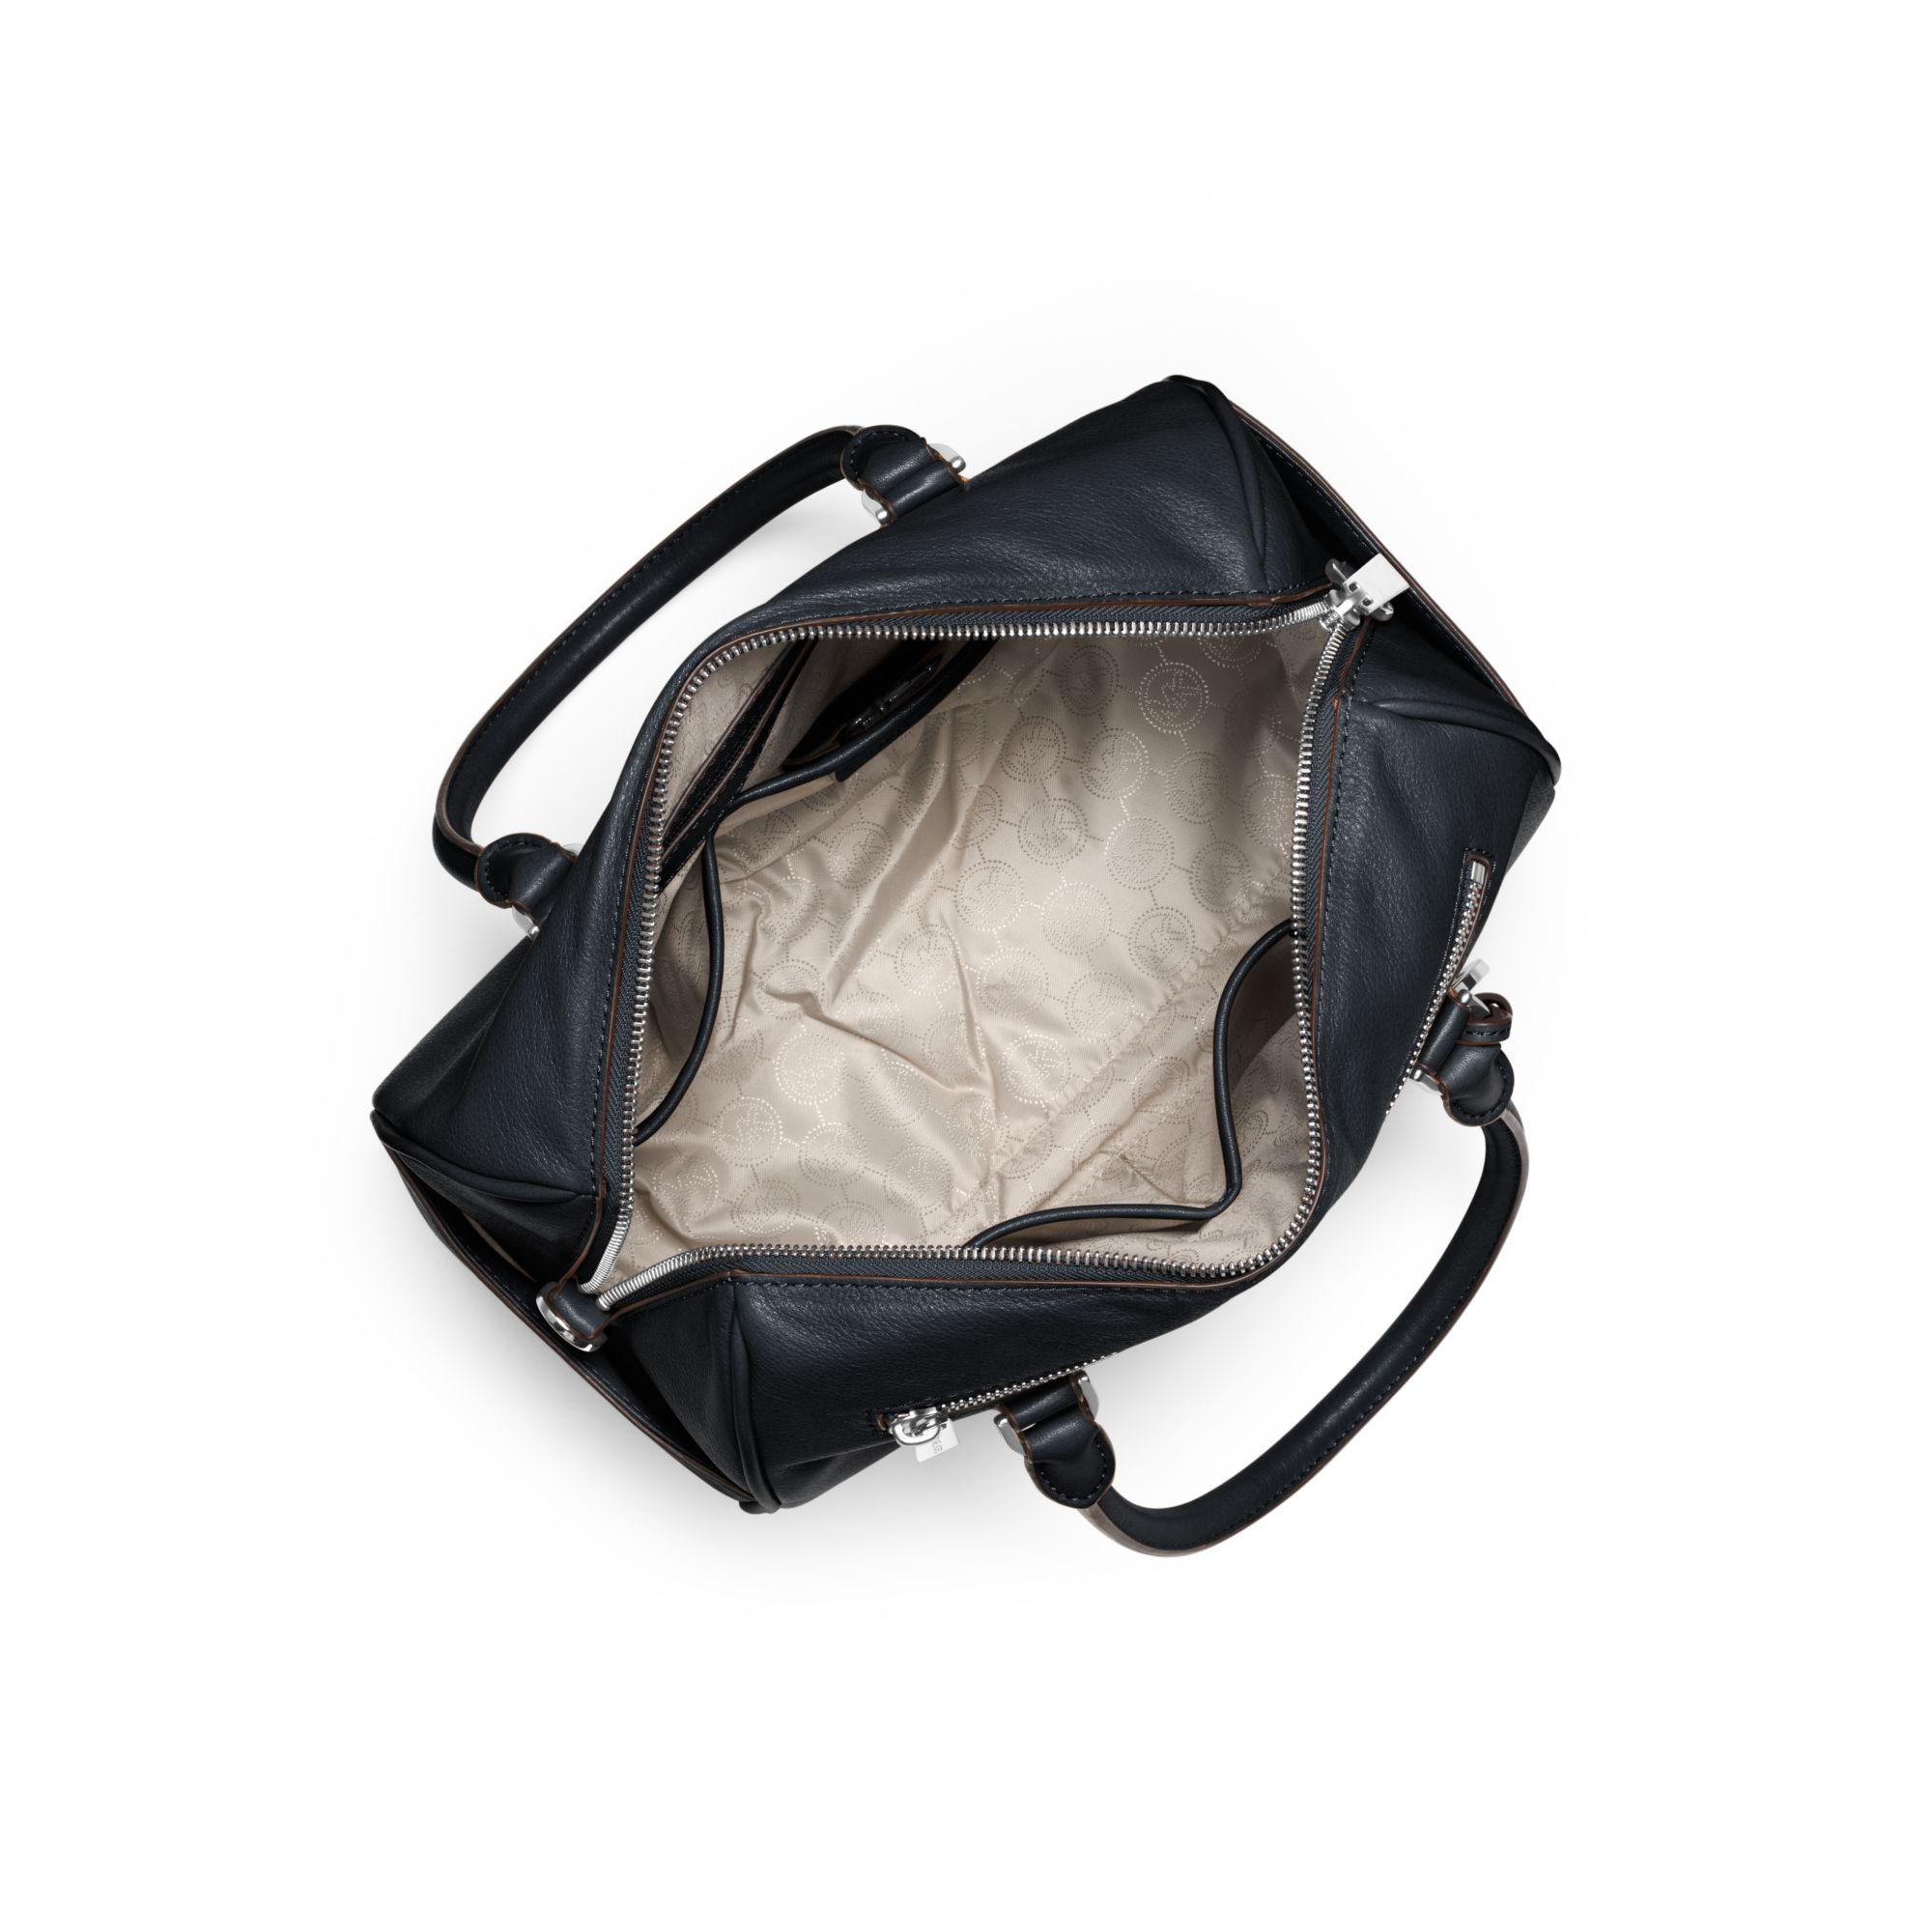 michael kors sophie large top zip satchel in blue lyst. Black Bedroom Furniture Sets. Home Design Ideas